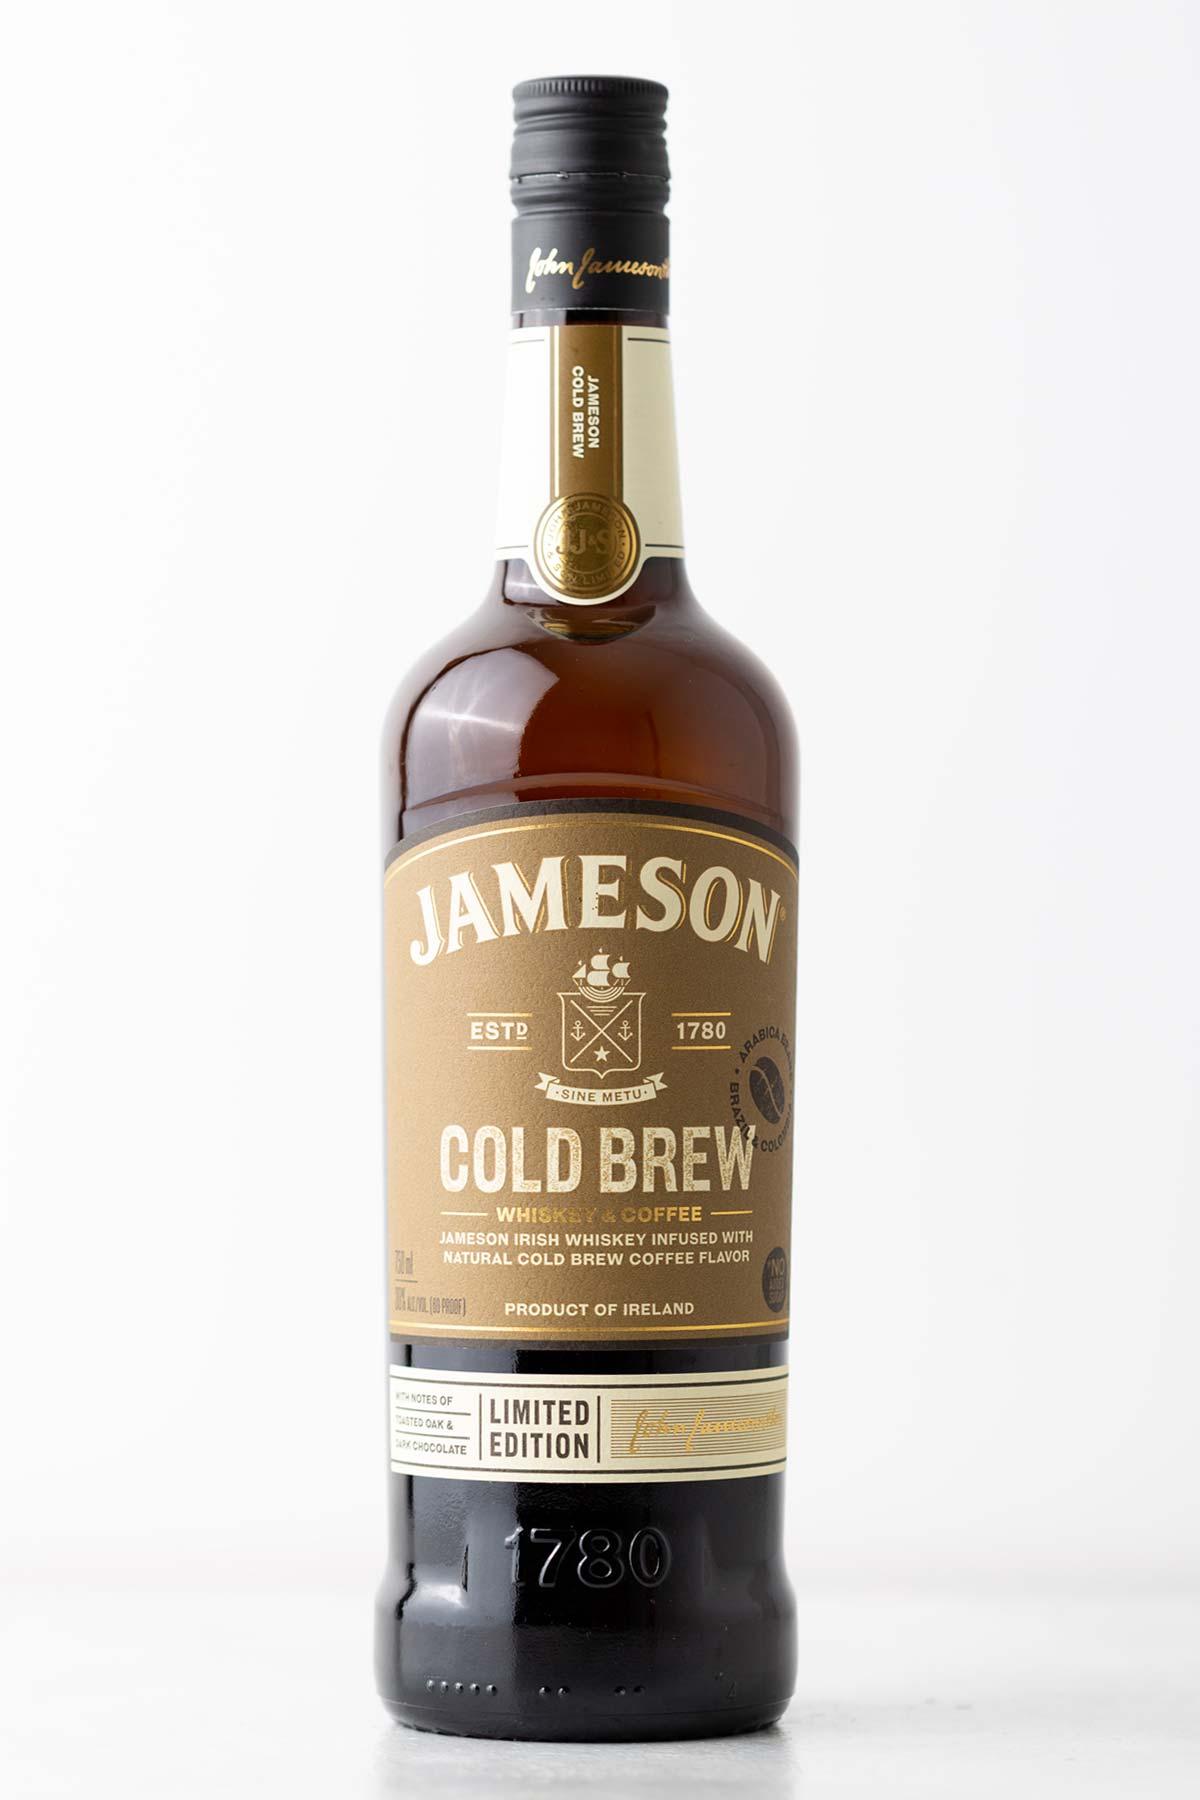 Jameson Cold Brew Irish Whiskey bottle.